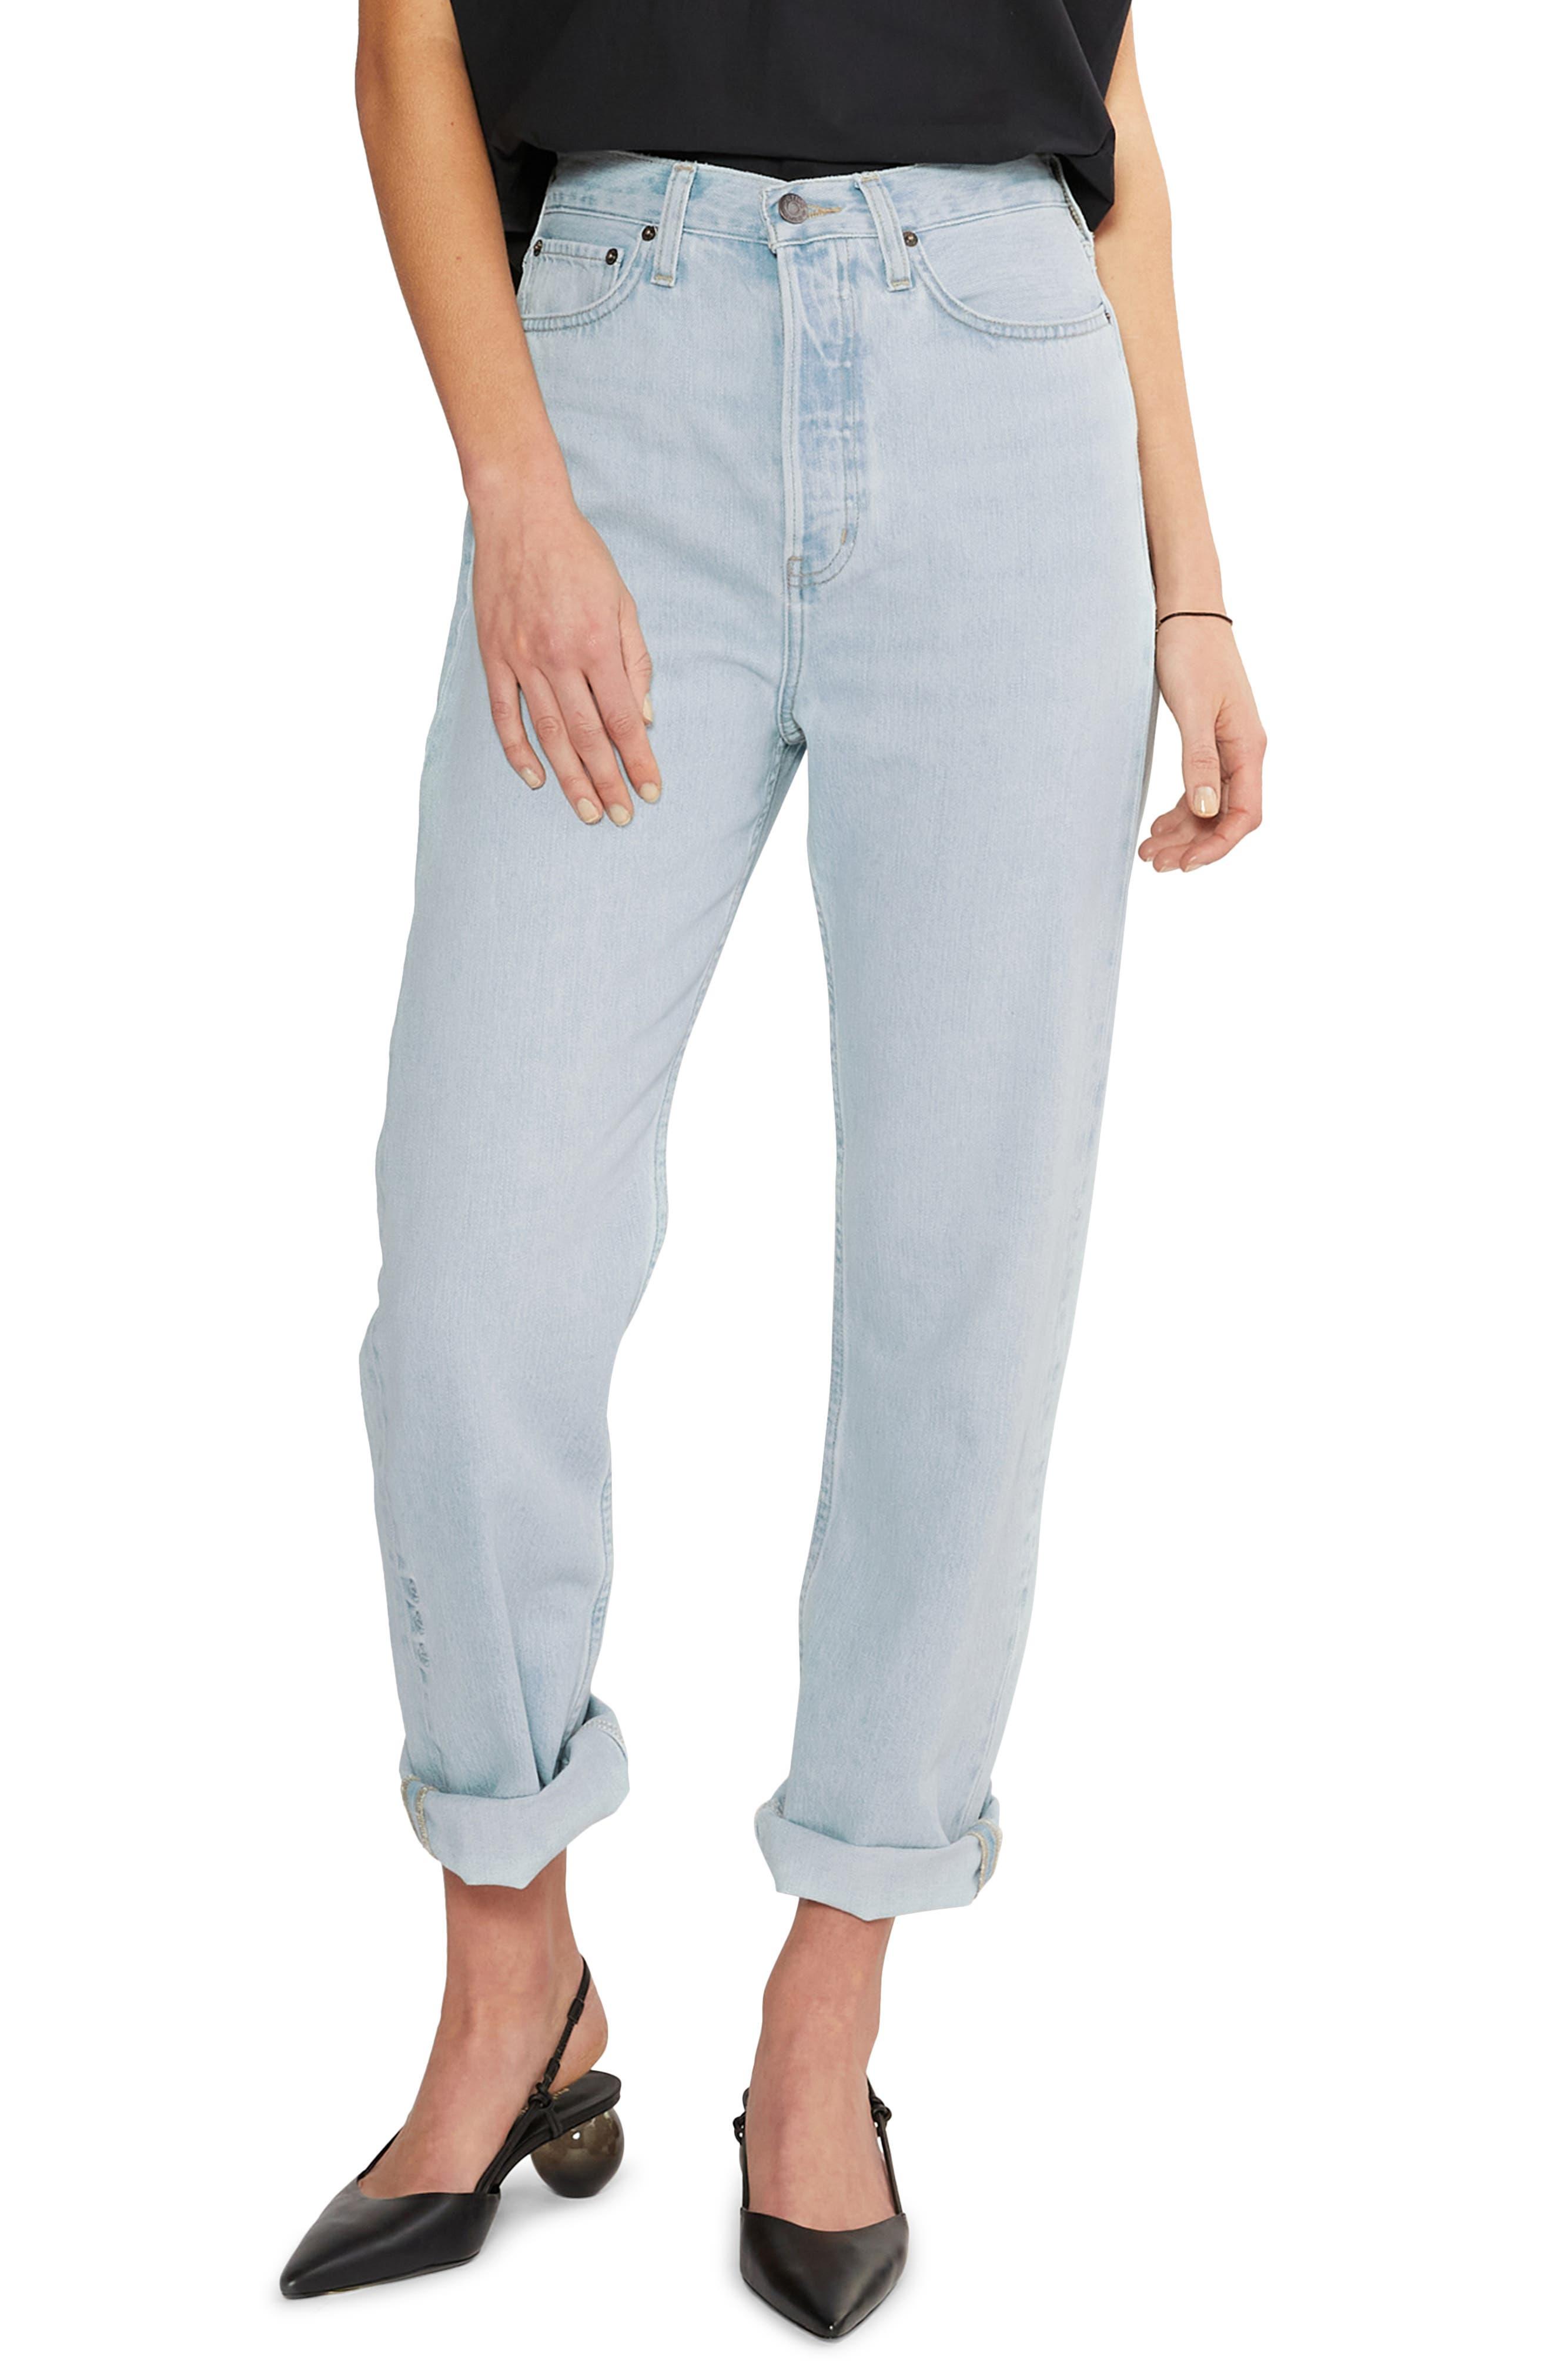 Women's Etica Bryce Pinch Waist Boyfriend Jeans